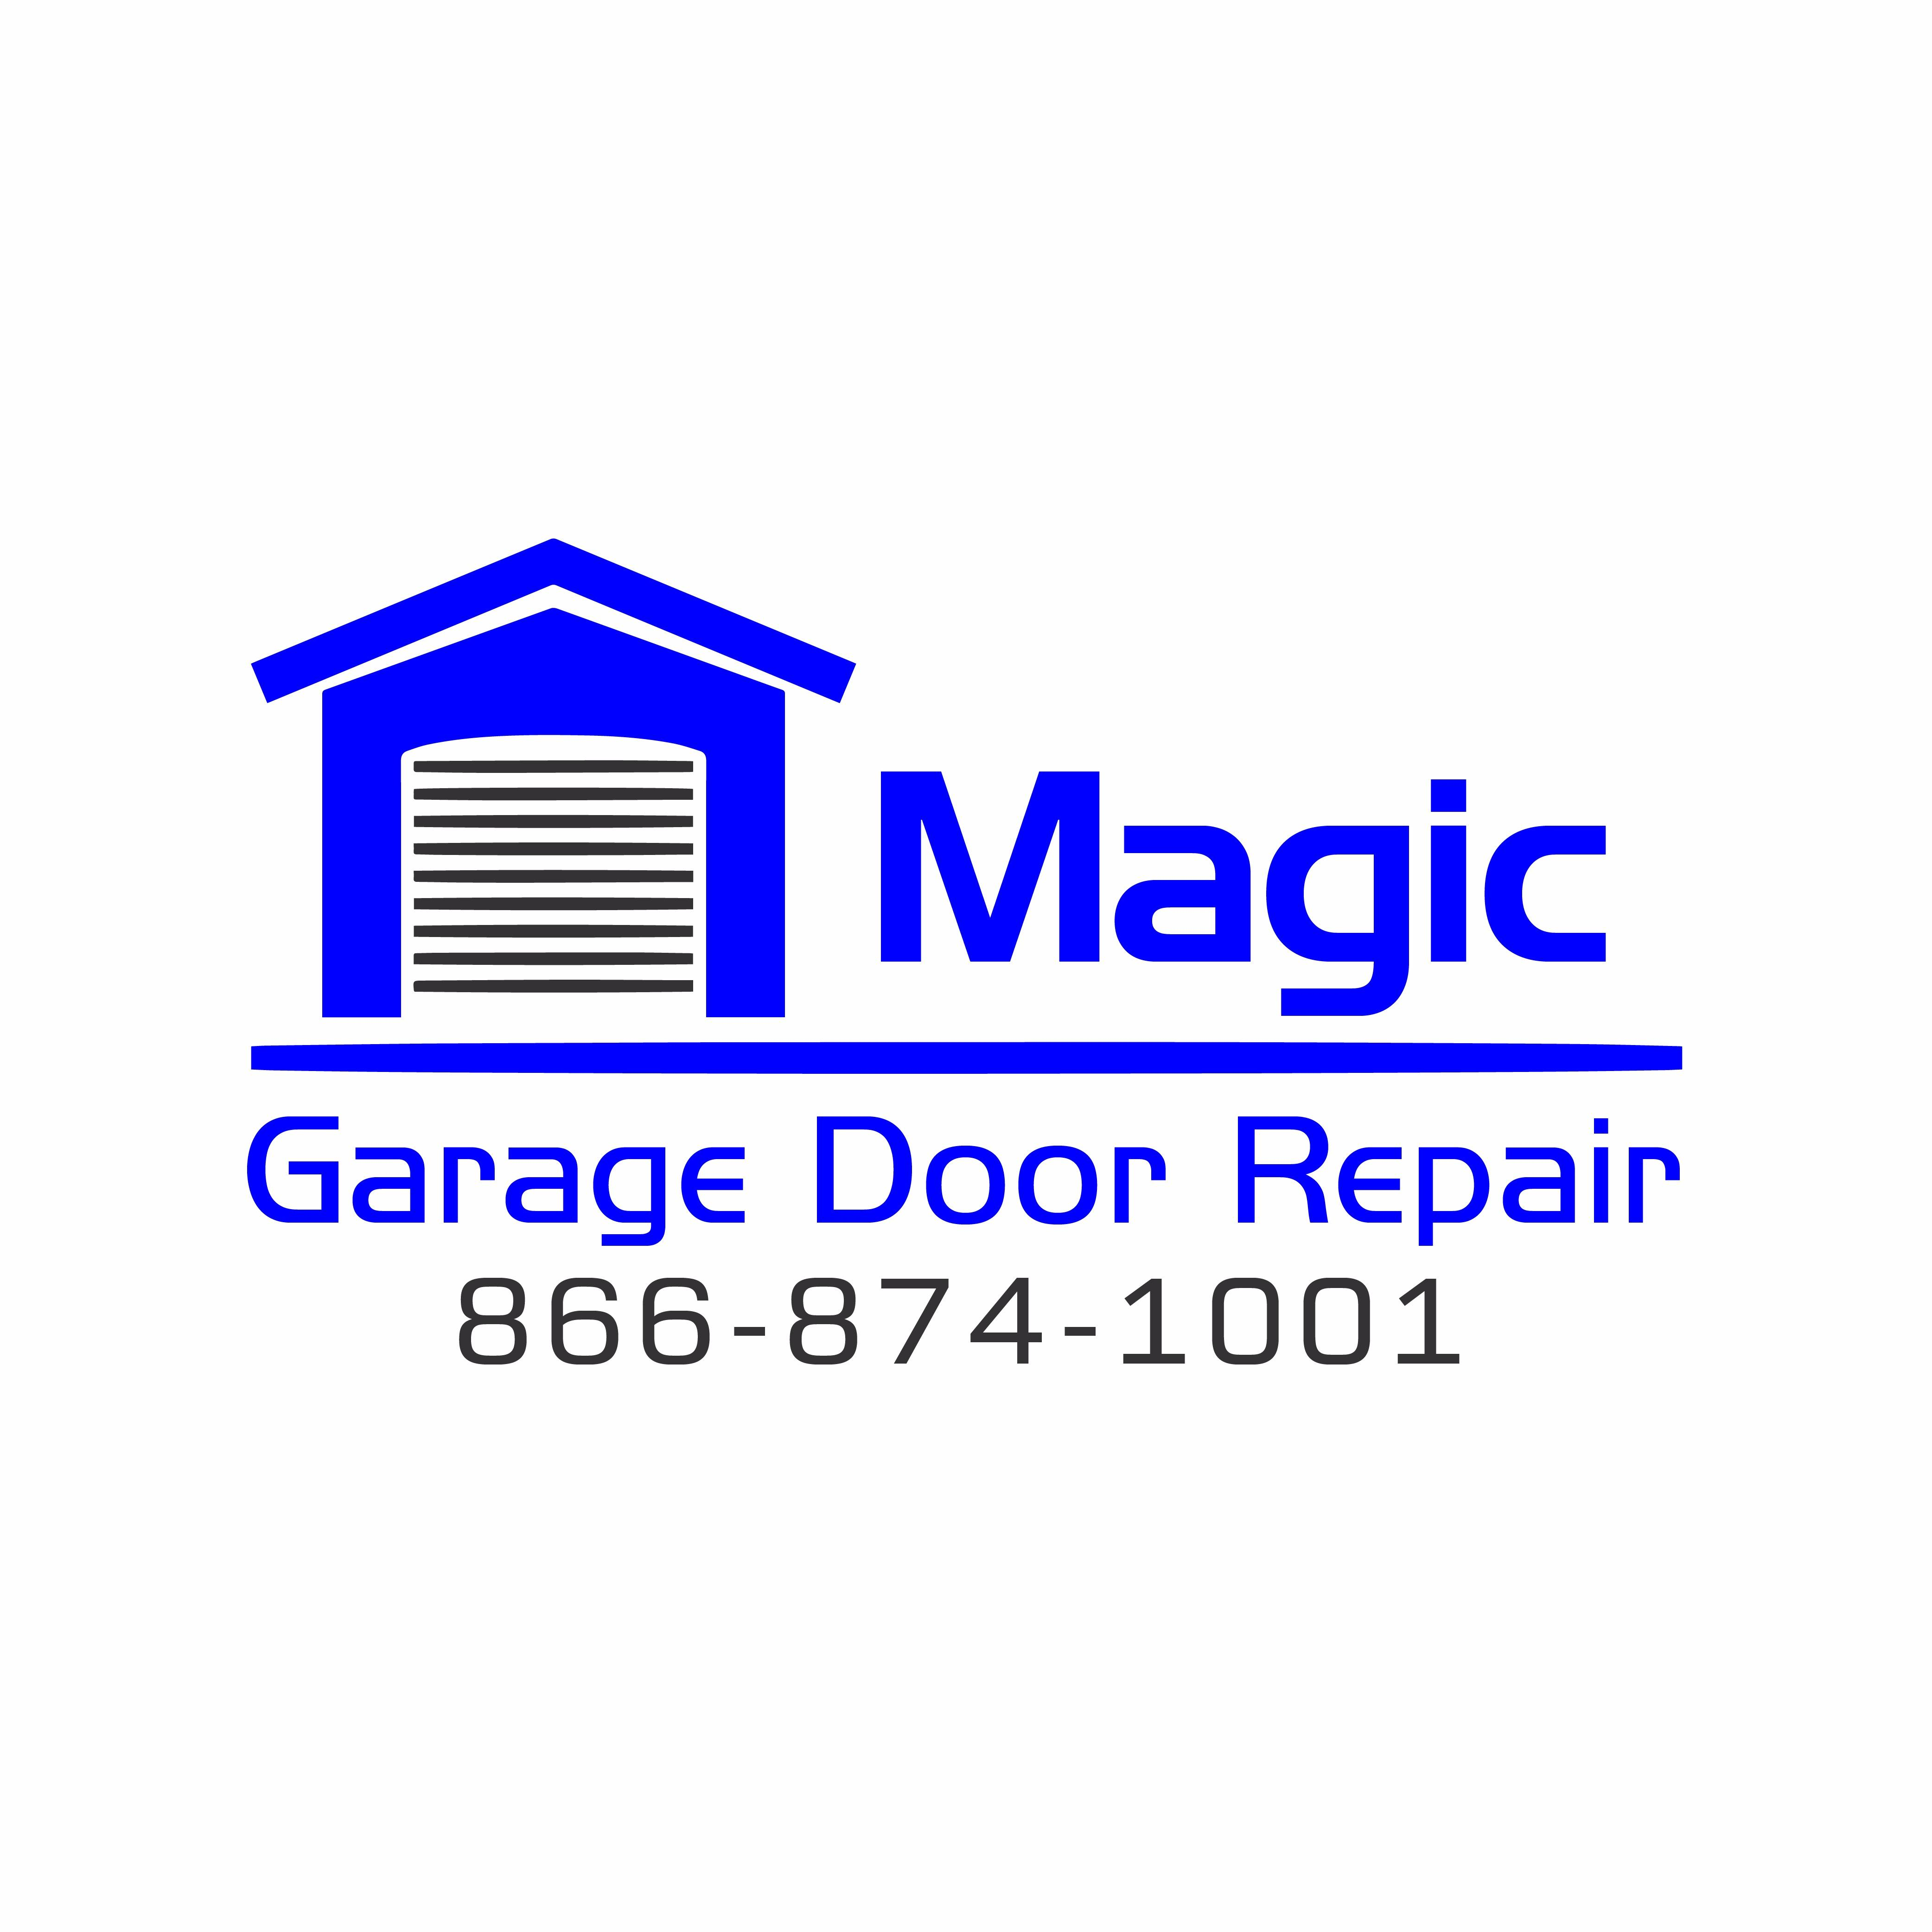 Premium Garage Door & Gate Repair Monrovia